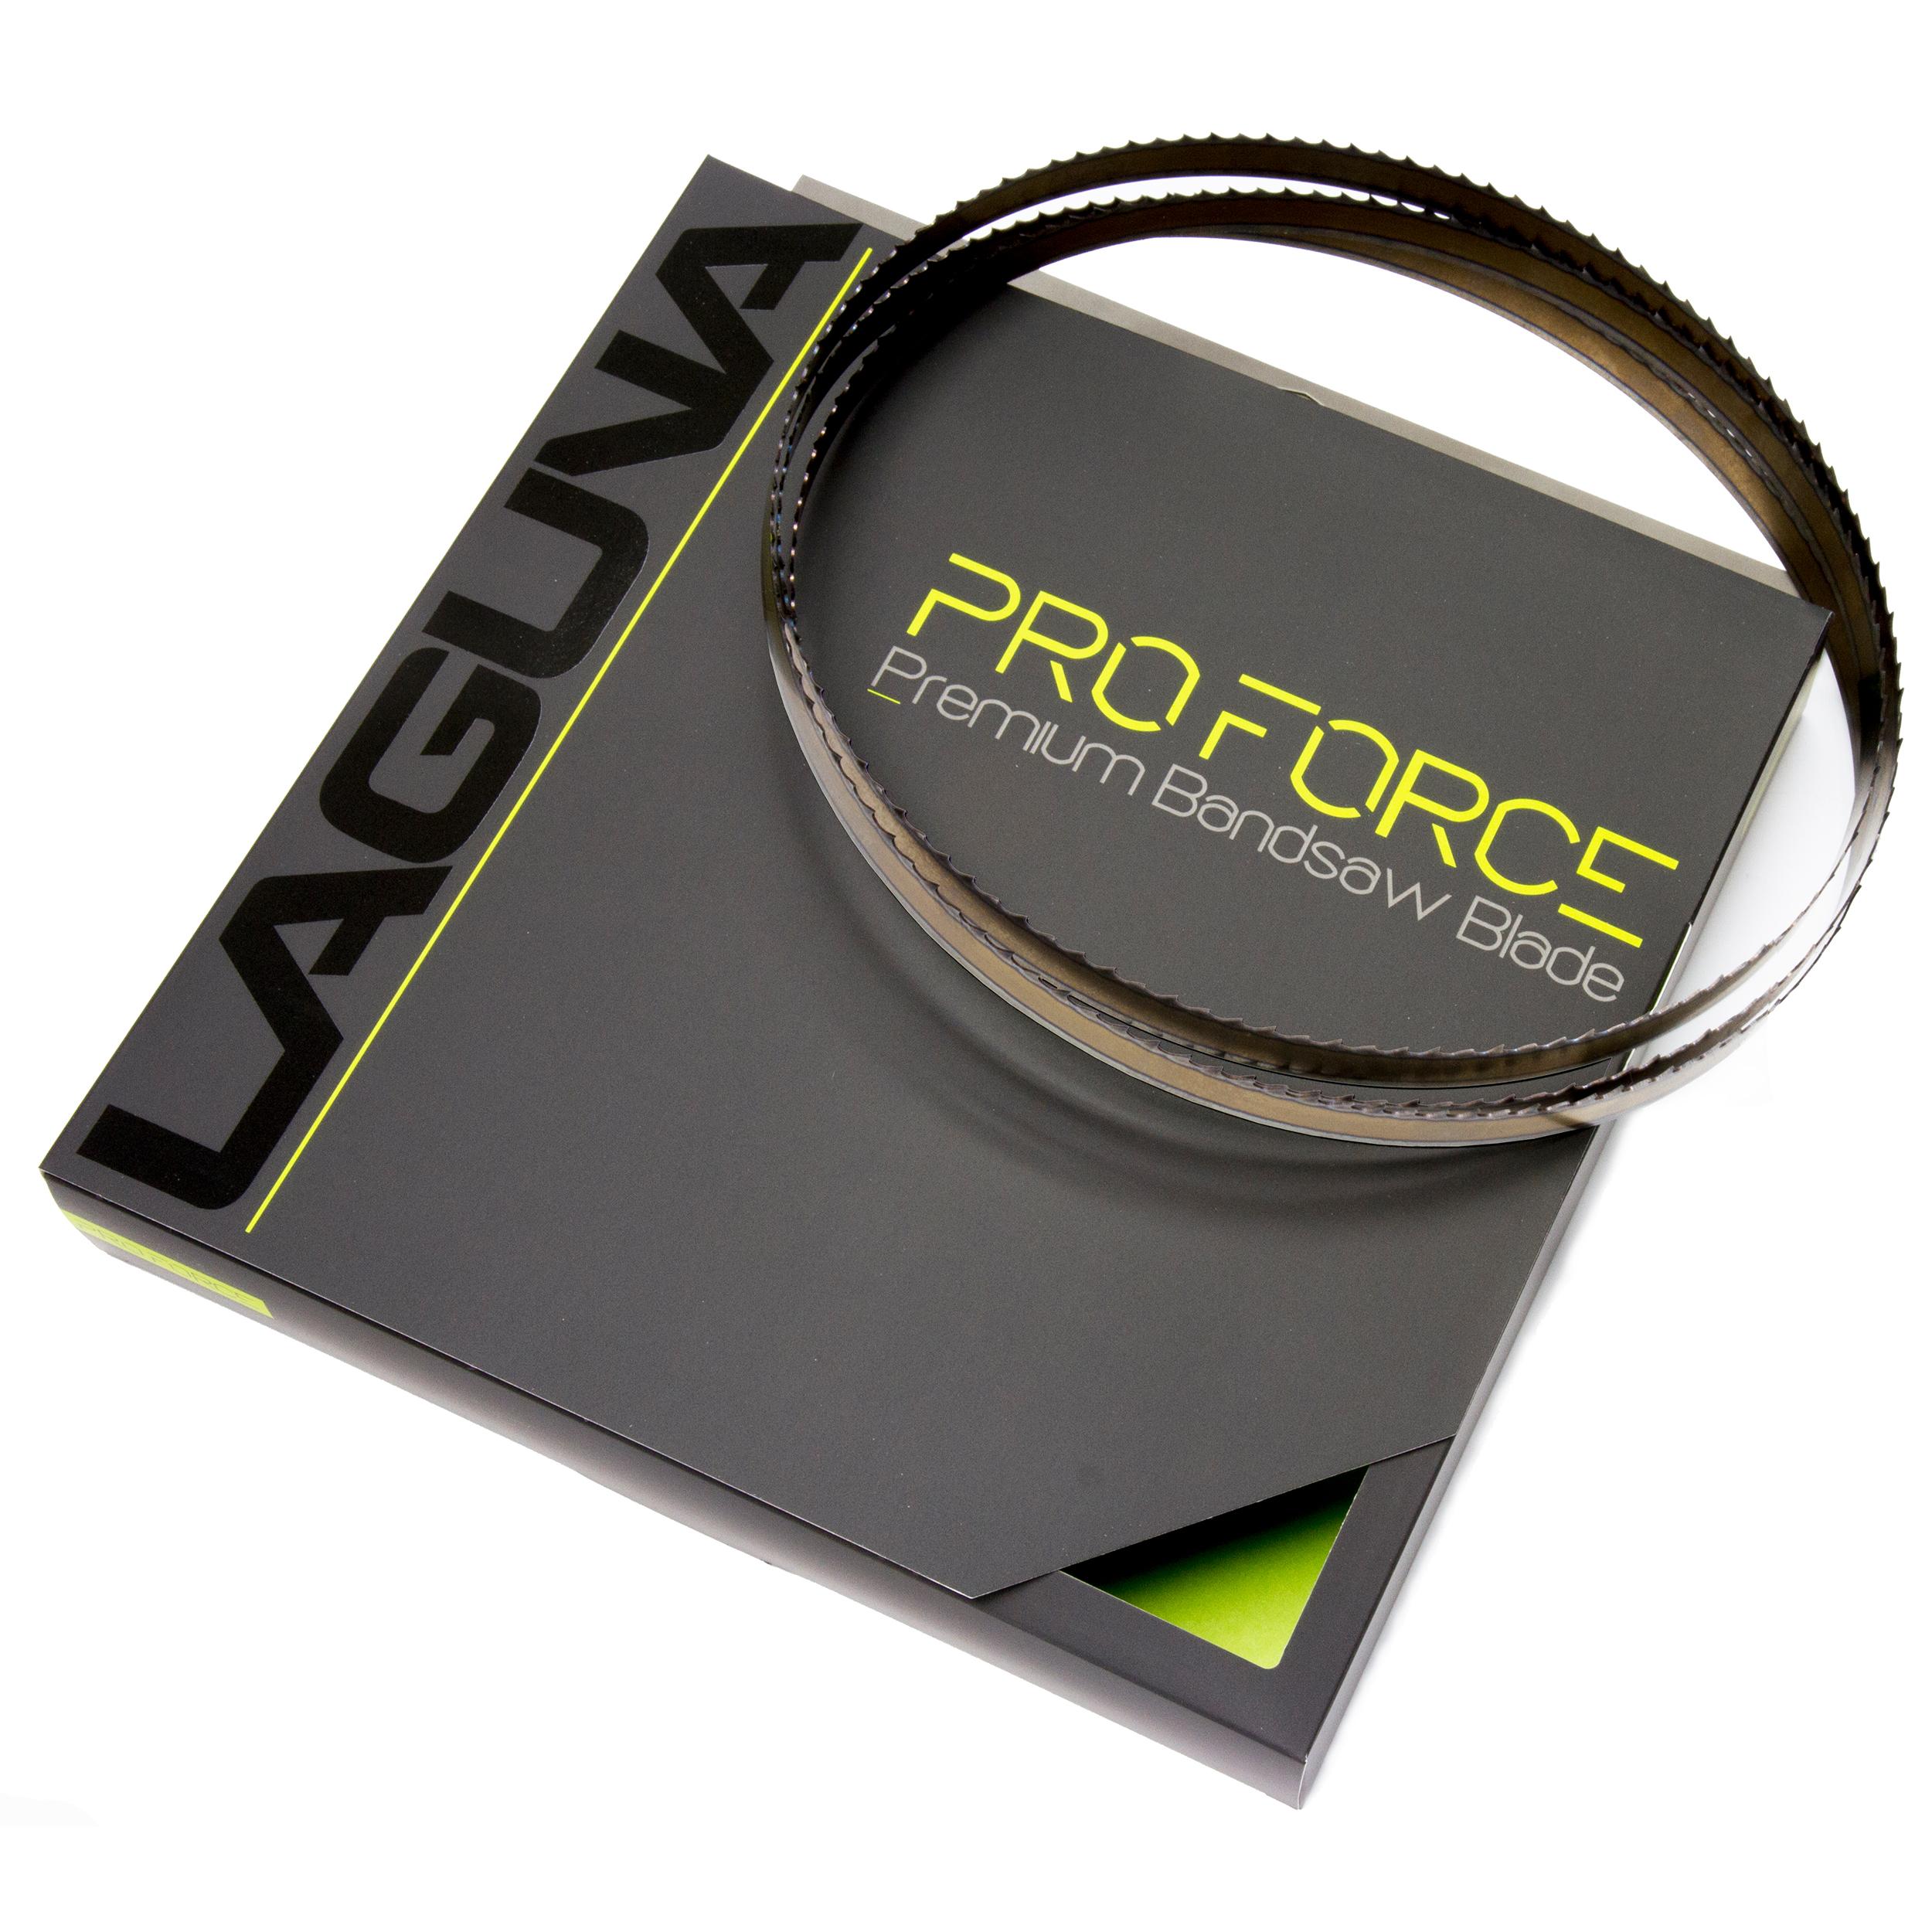 Pro Force 1 / 2 x 14 TPI x 150 Bandsaw Blade